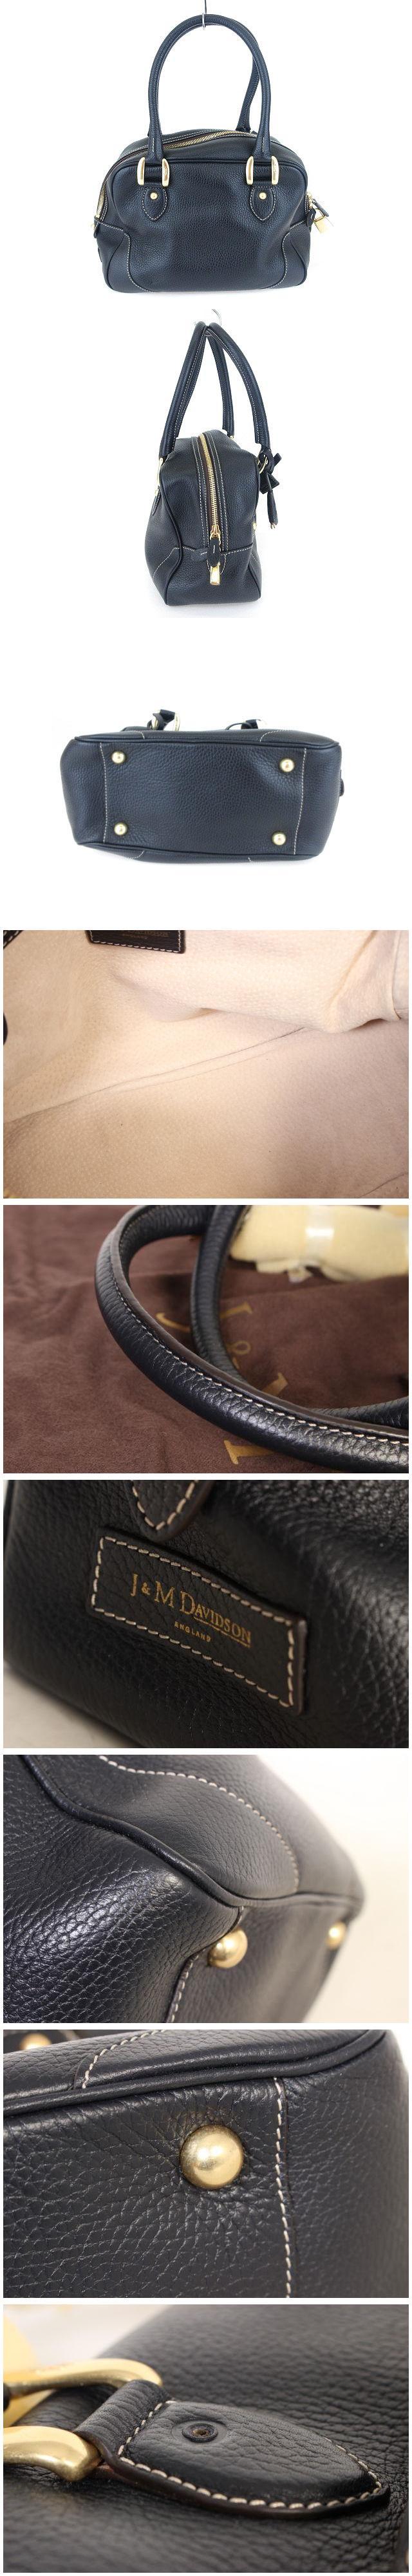 MINI MIA バッグ ハンド チャーム レザー 紺 ネイビー /mm0524